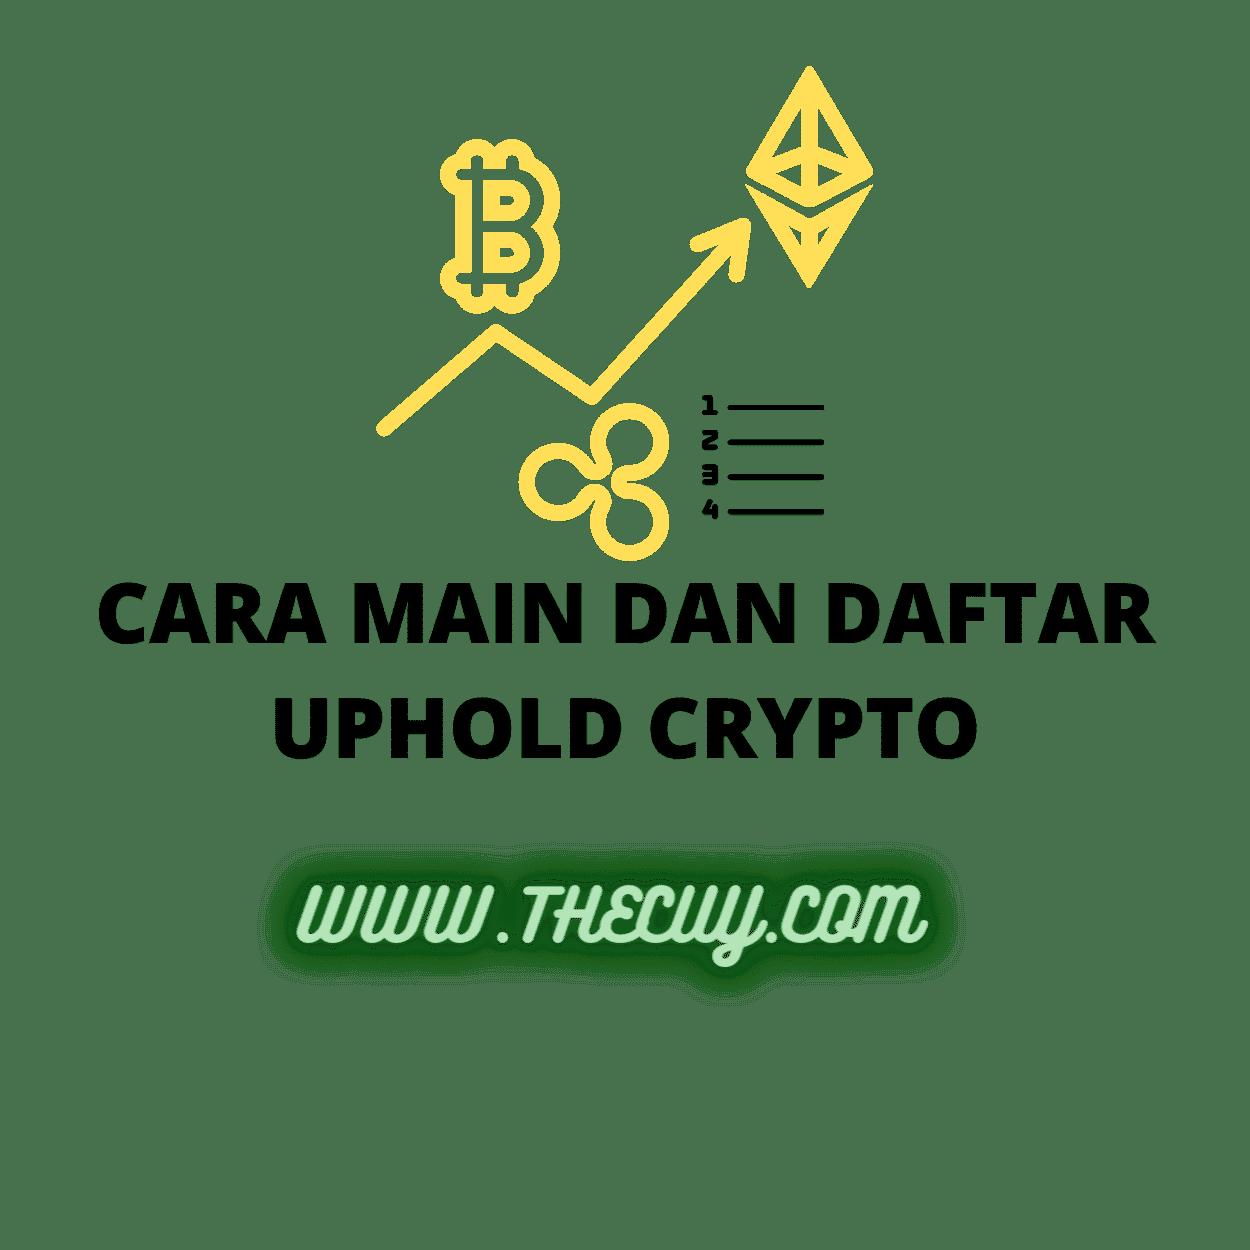 CARA MAIN DAN DAFTAR UPHOLD CRYPTO